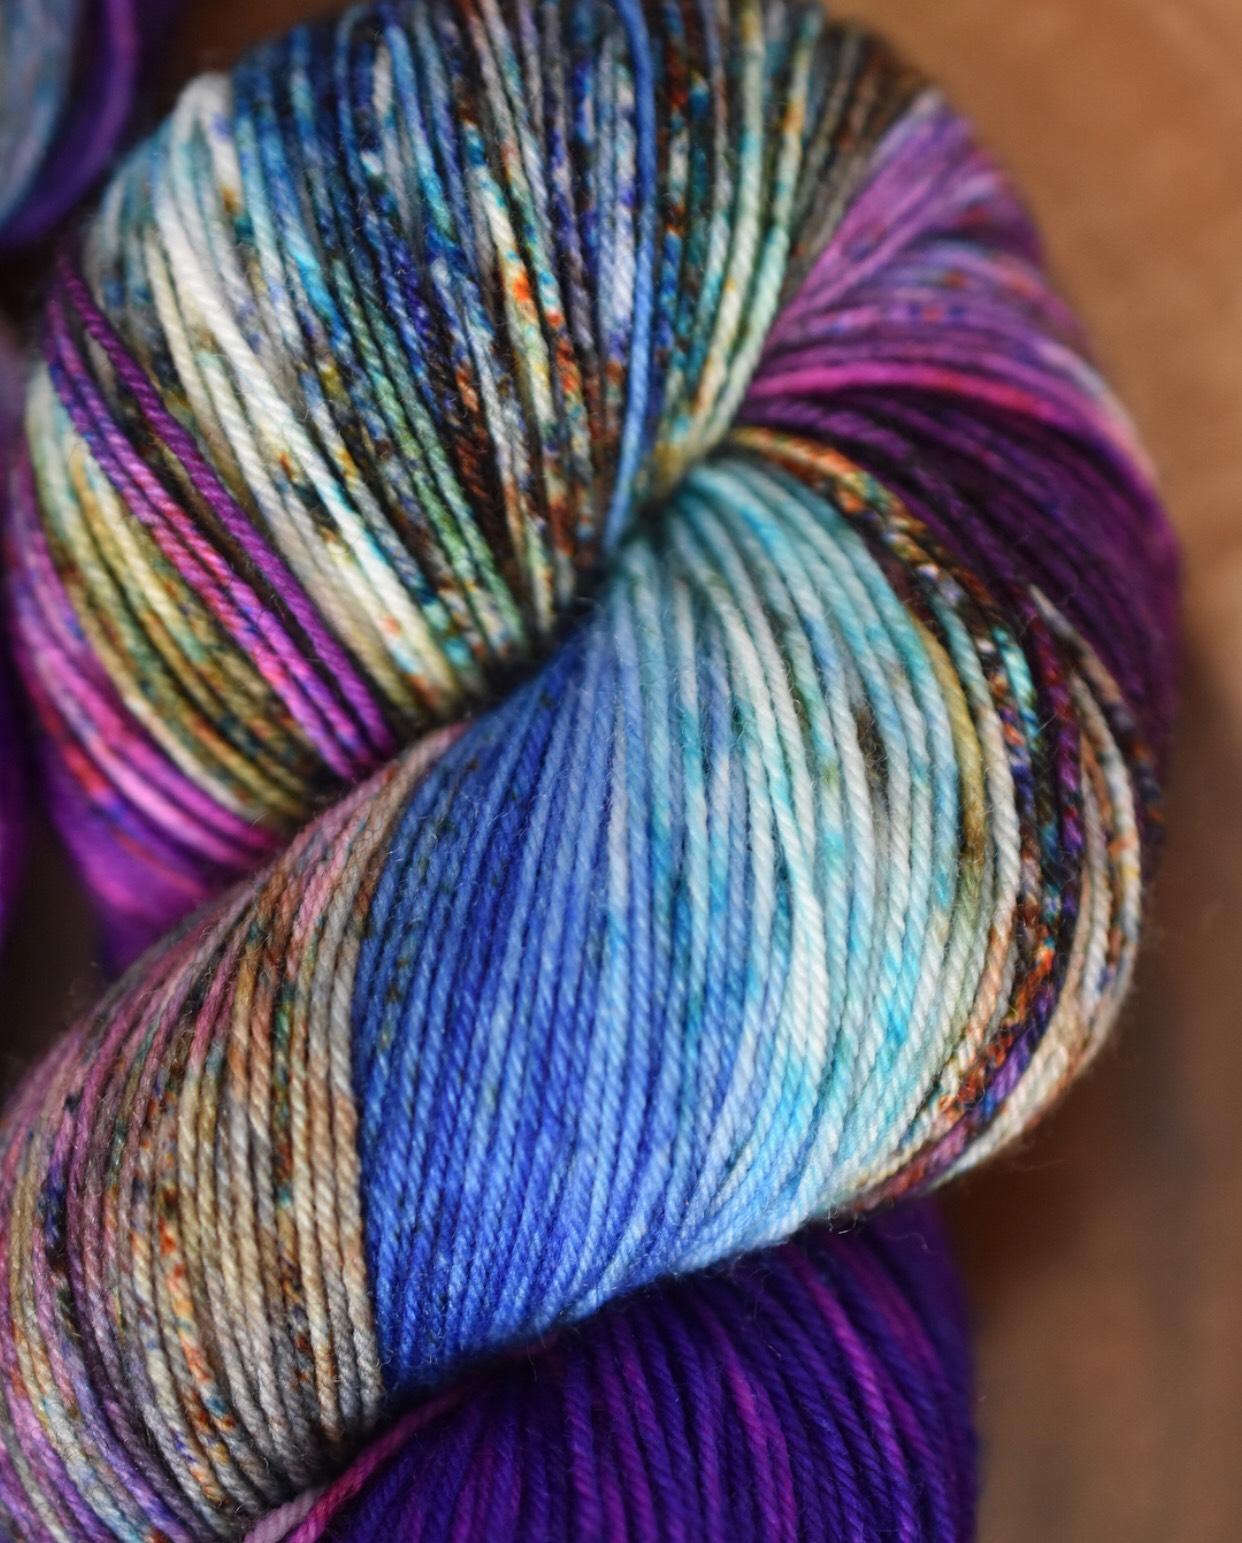 yarn8.jpeg